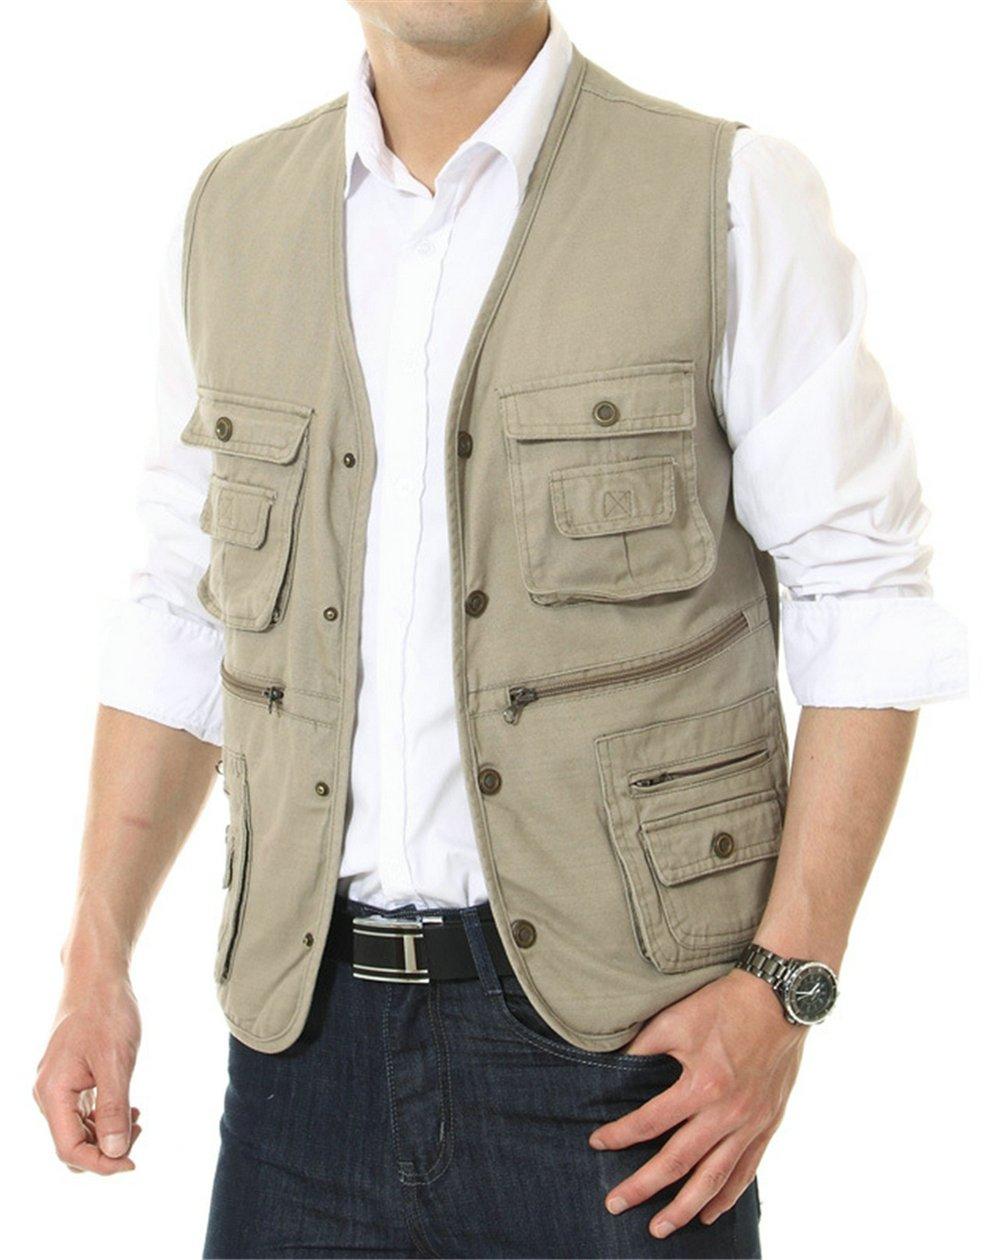 APTRO Men's 100% Cotton Outdoor Multi Pocket Vest Khaki US XL (ASIN TAG 4XL)